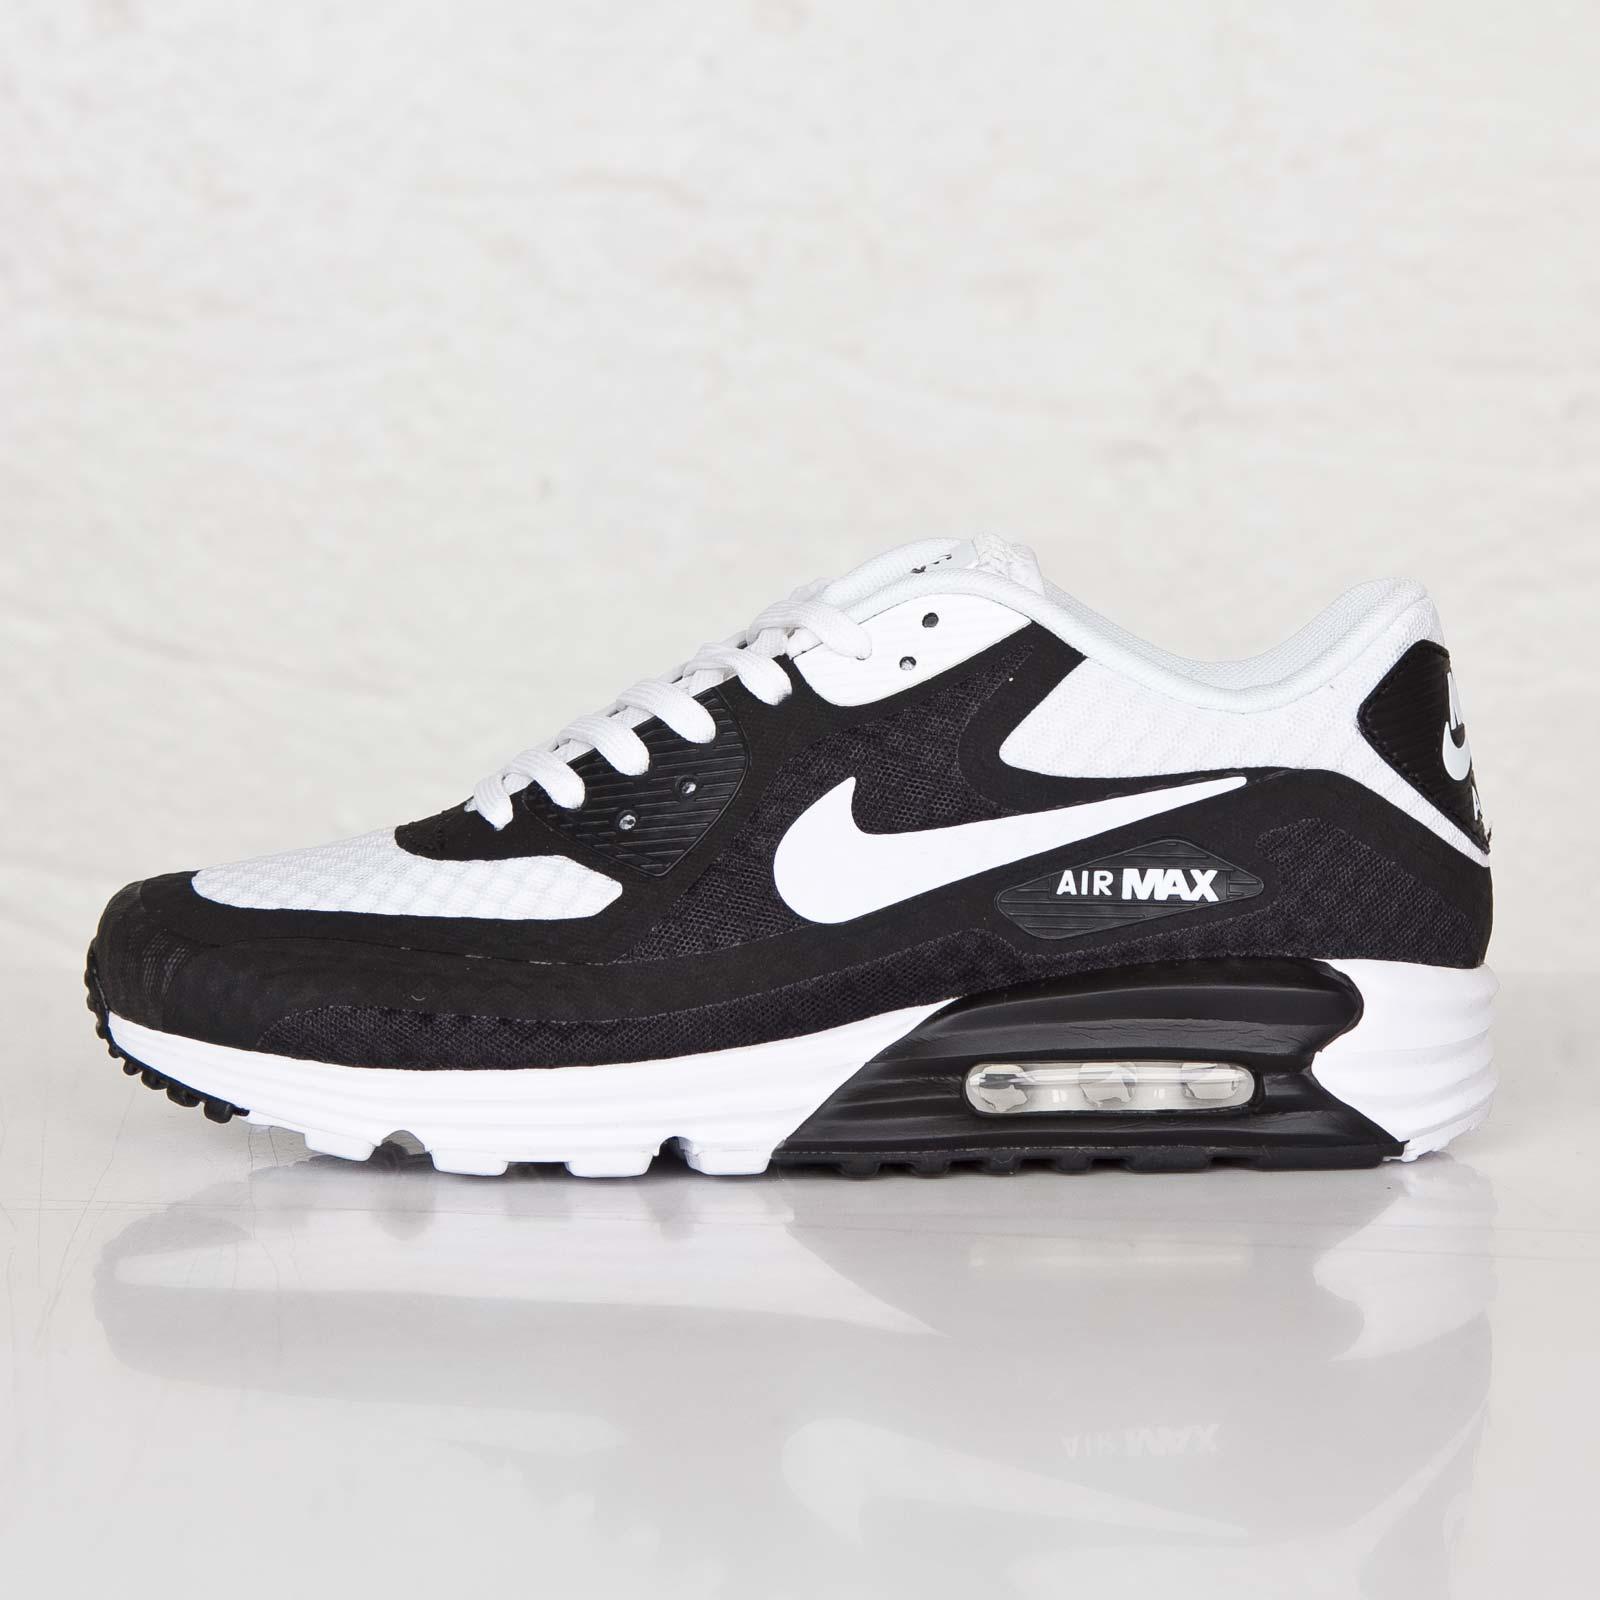 f7106d3254 Nike Air Max Lunar90 Breeze - 724078-001 - Sneakersnstuff   sneakers &  streetwear online since 1999